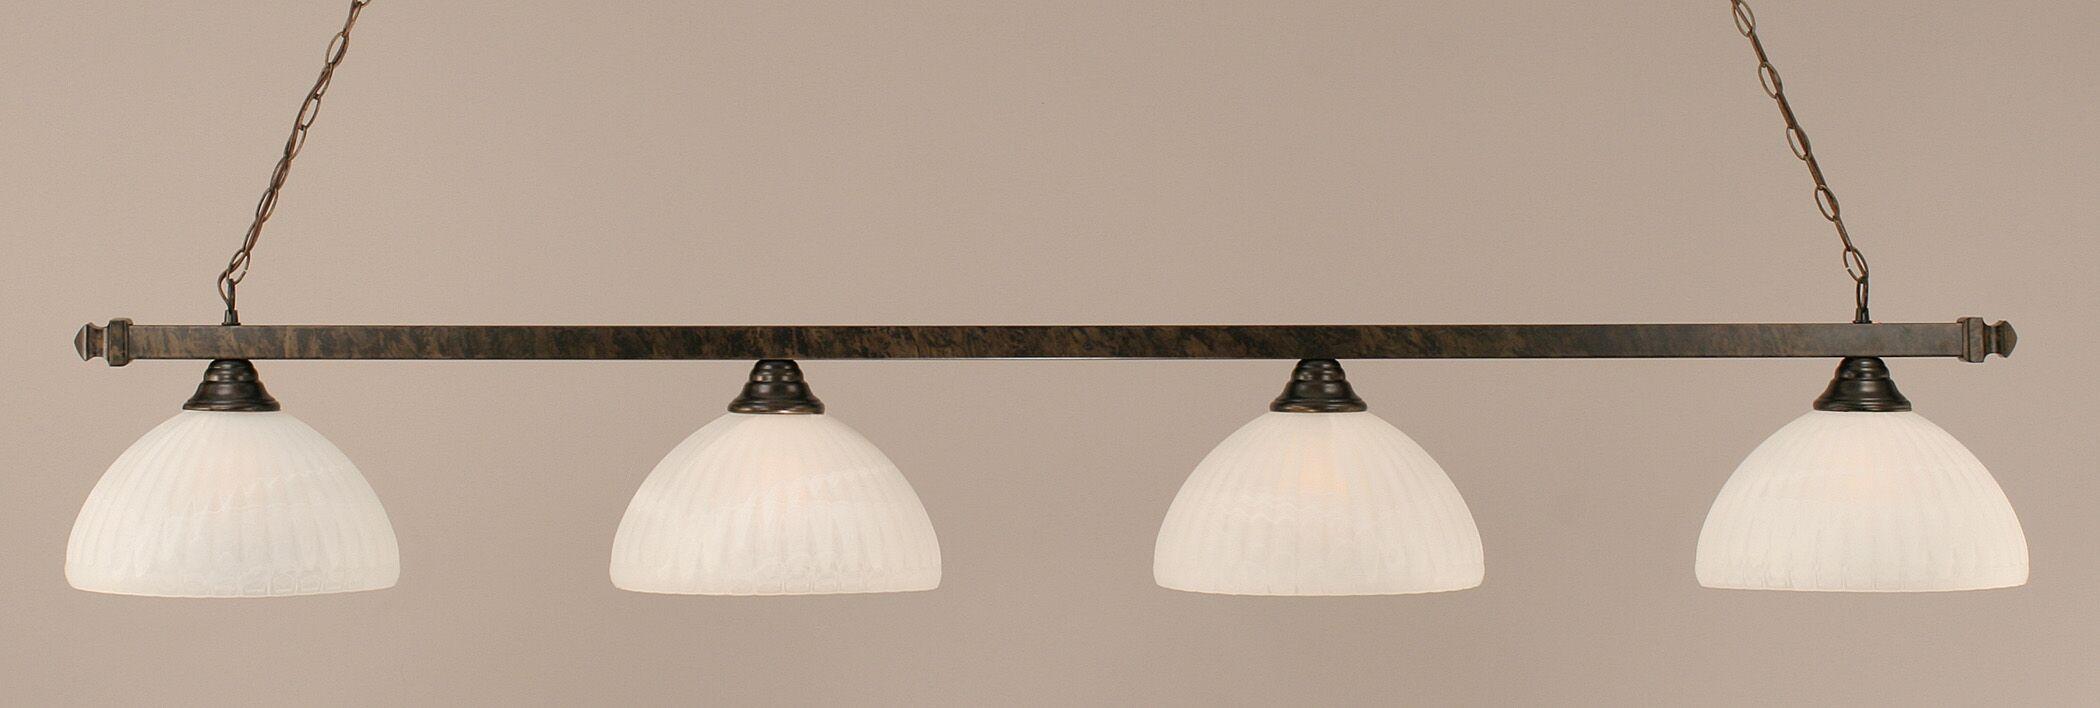 Varela 4-Light Pool Table Light